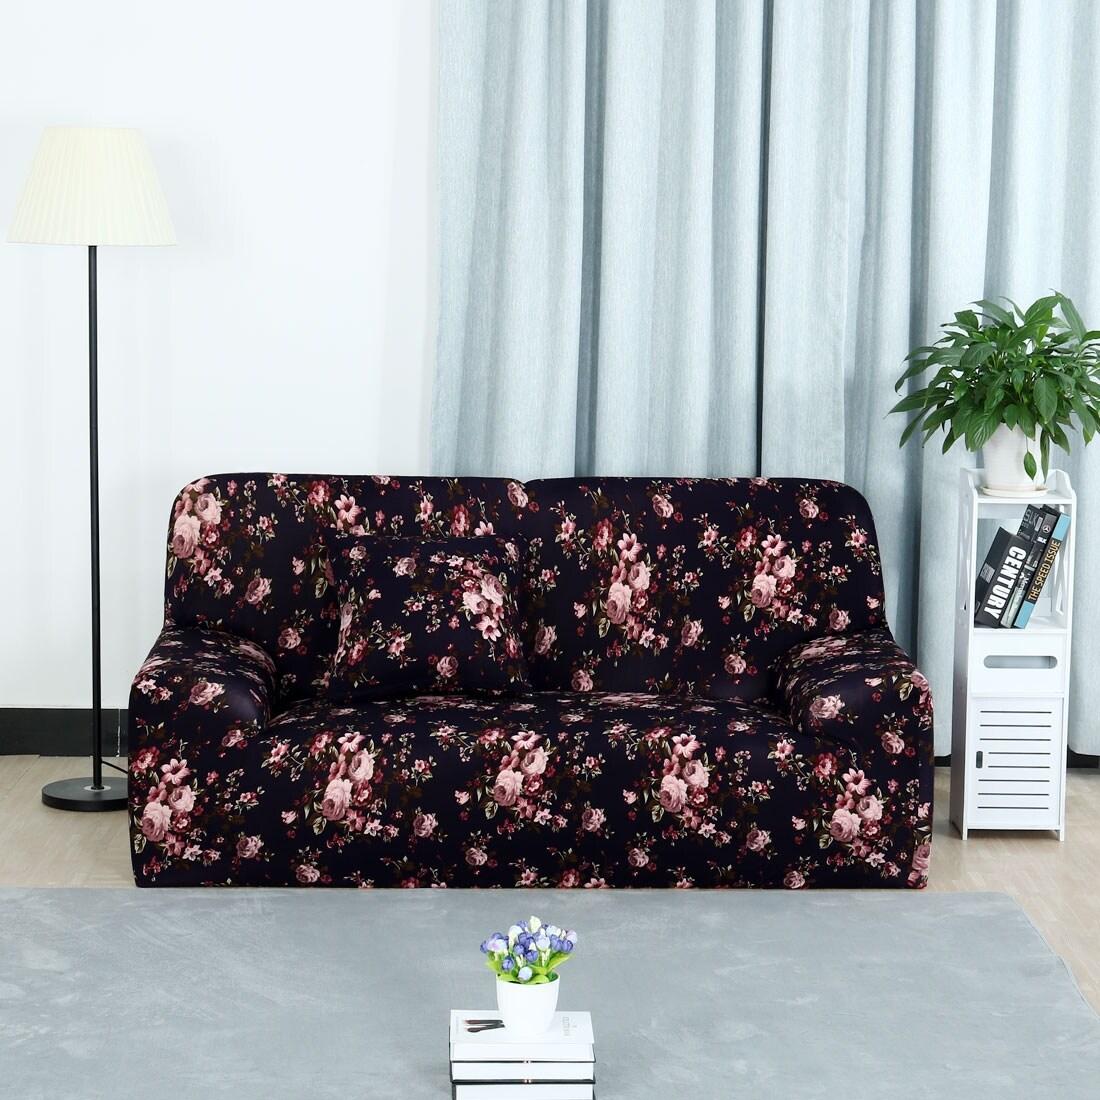 4 Seats Cover Sofa Loveseat